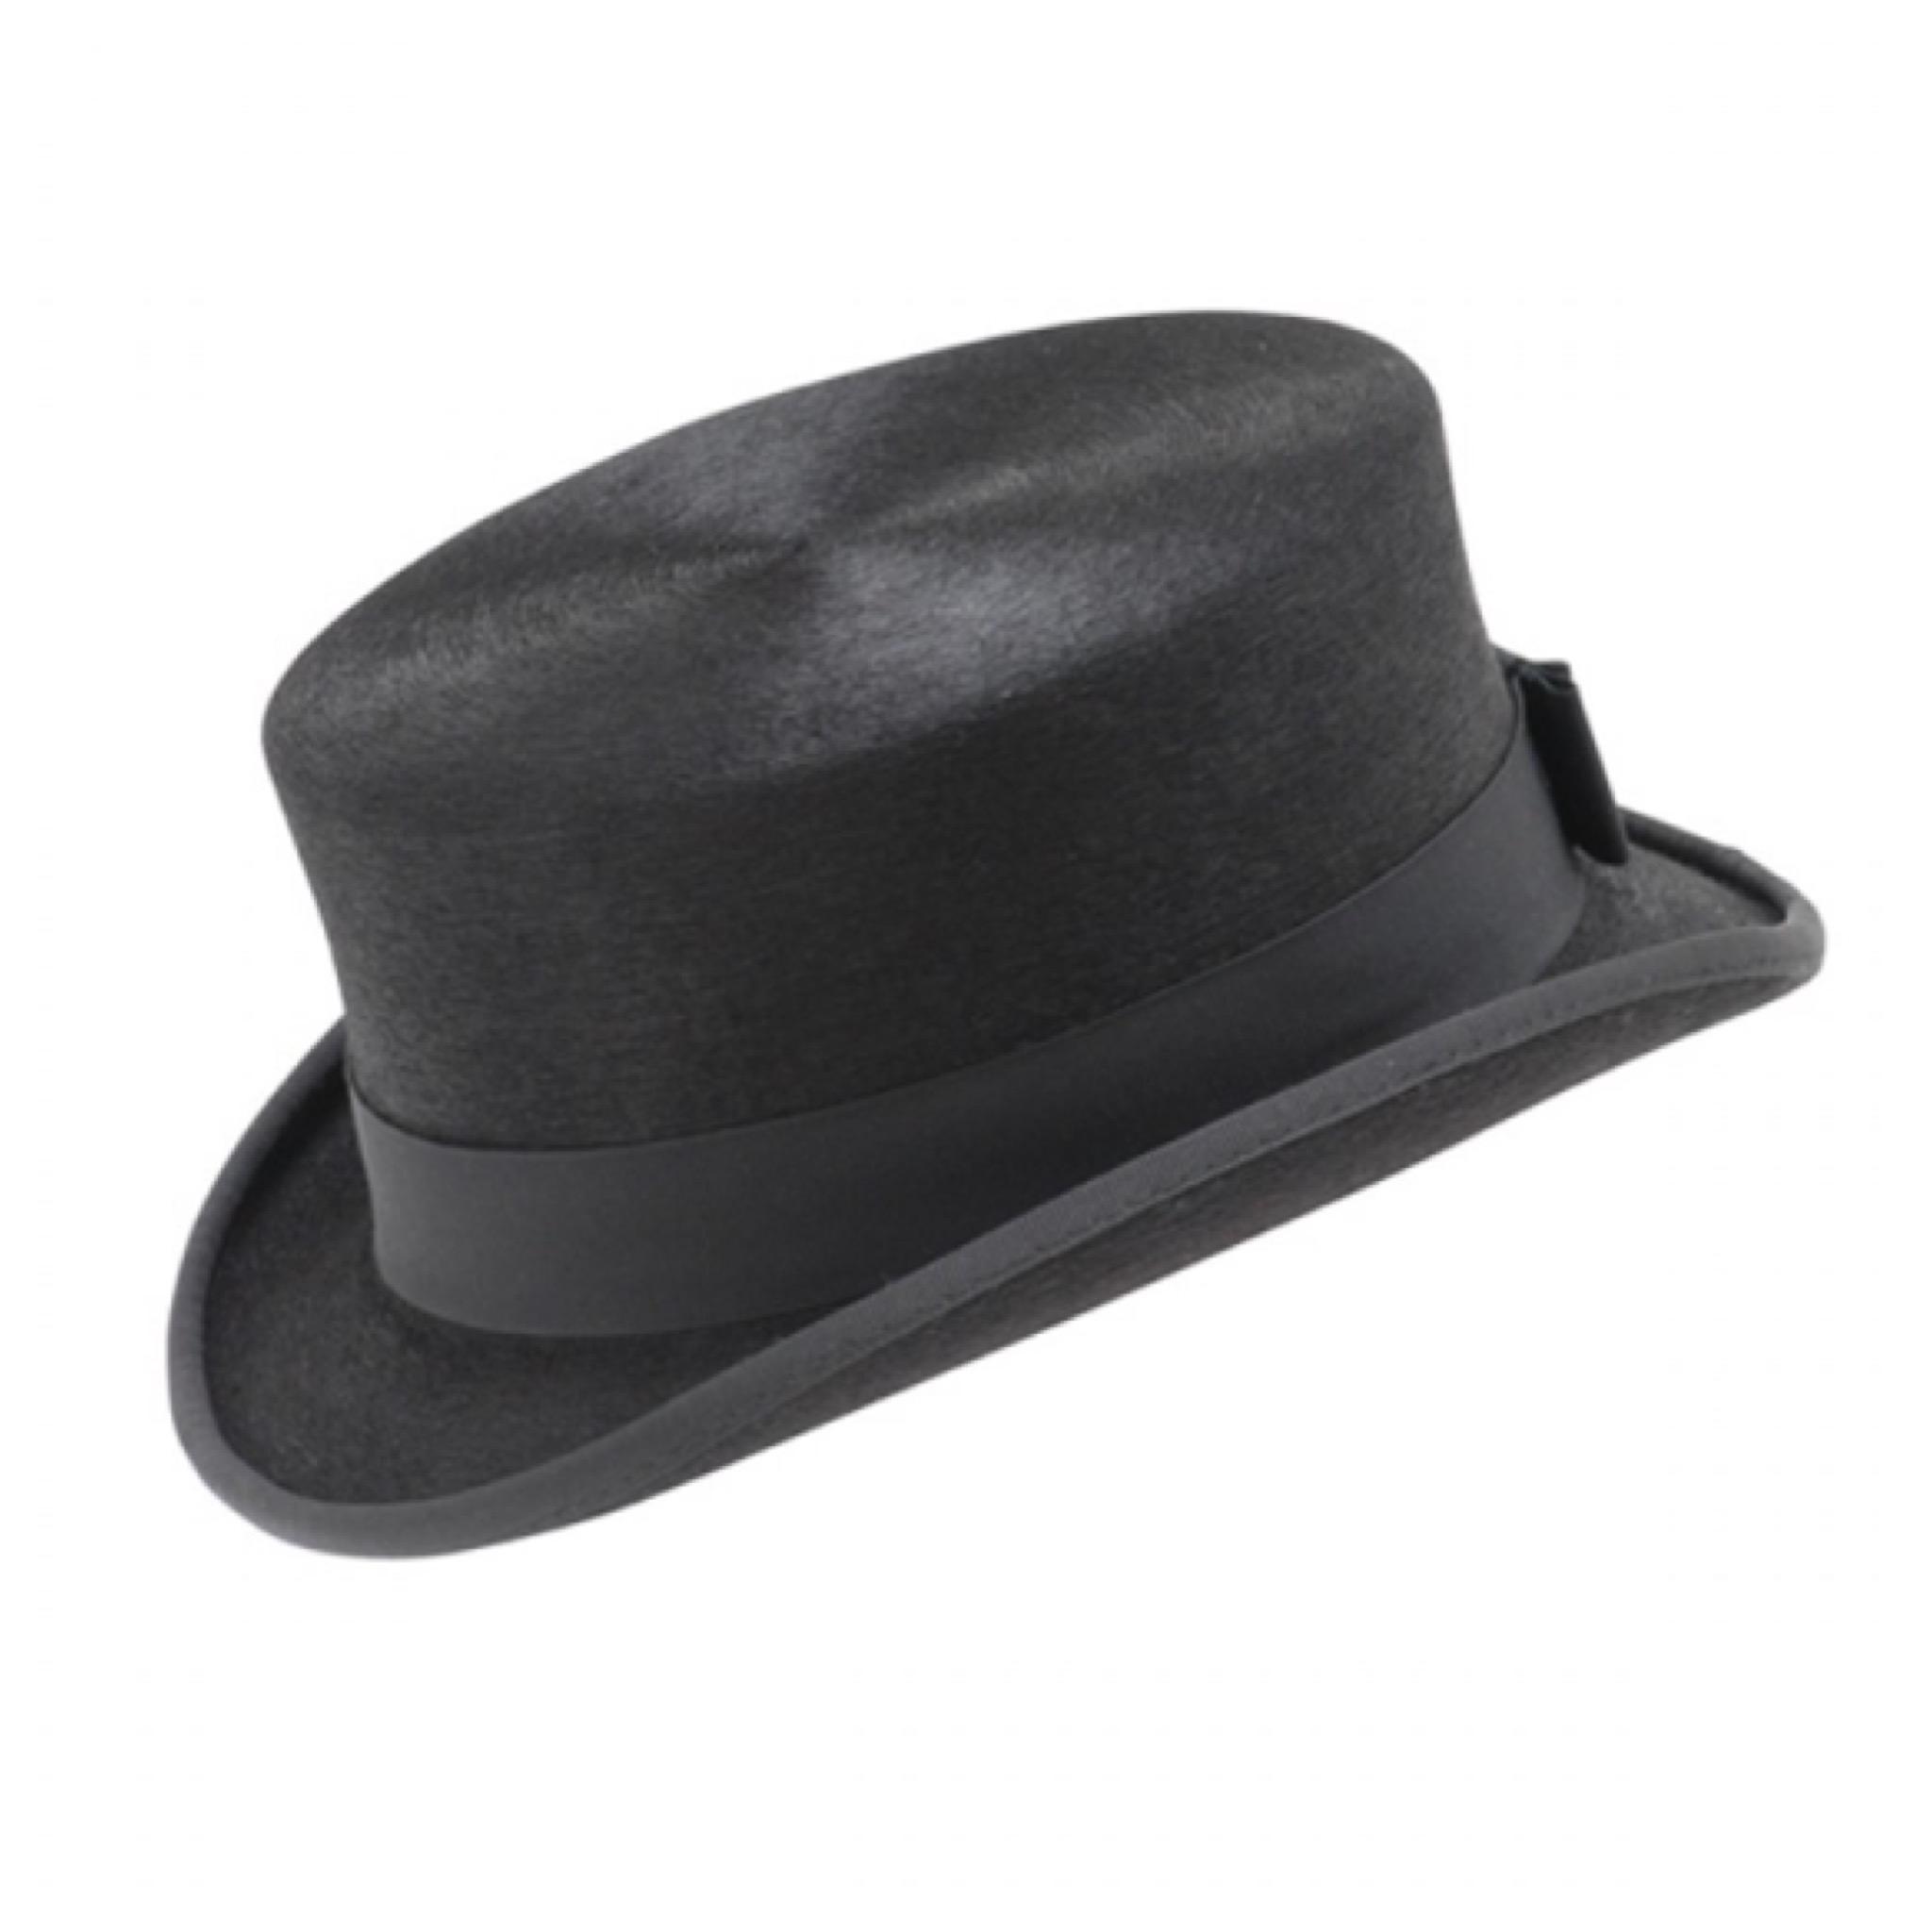 Helen Kaminski top hat